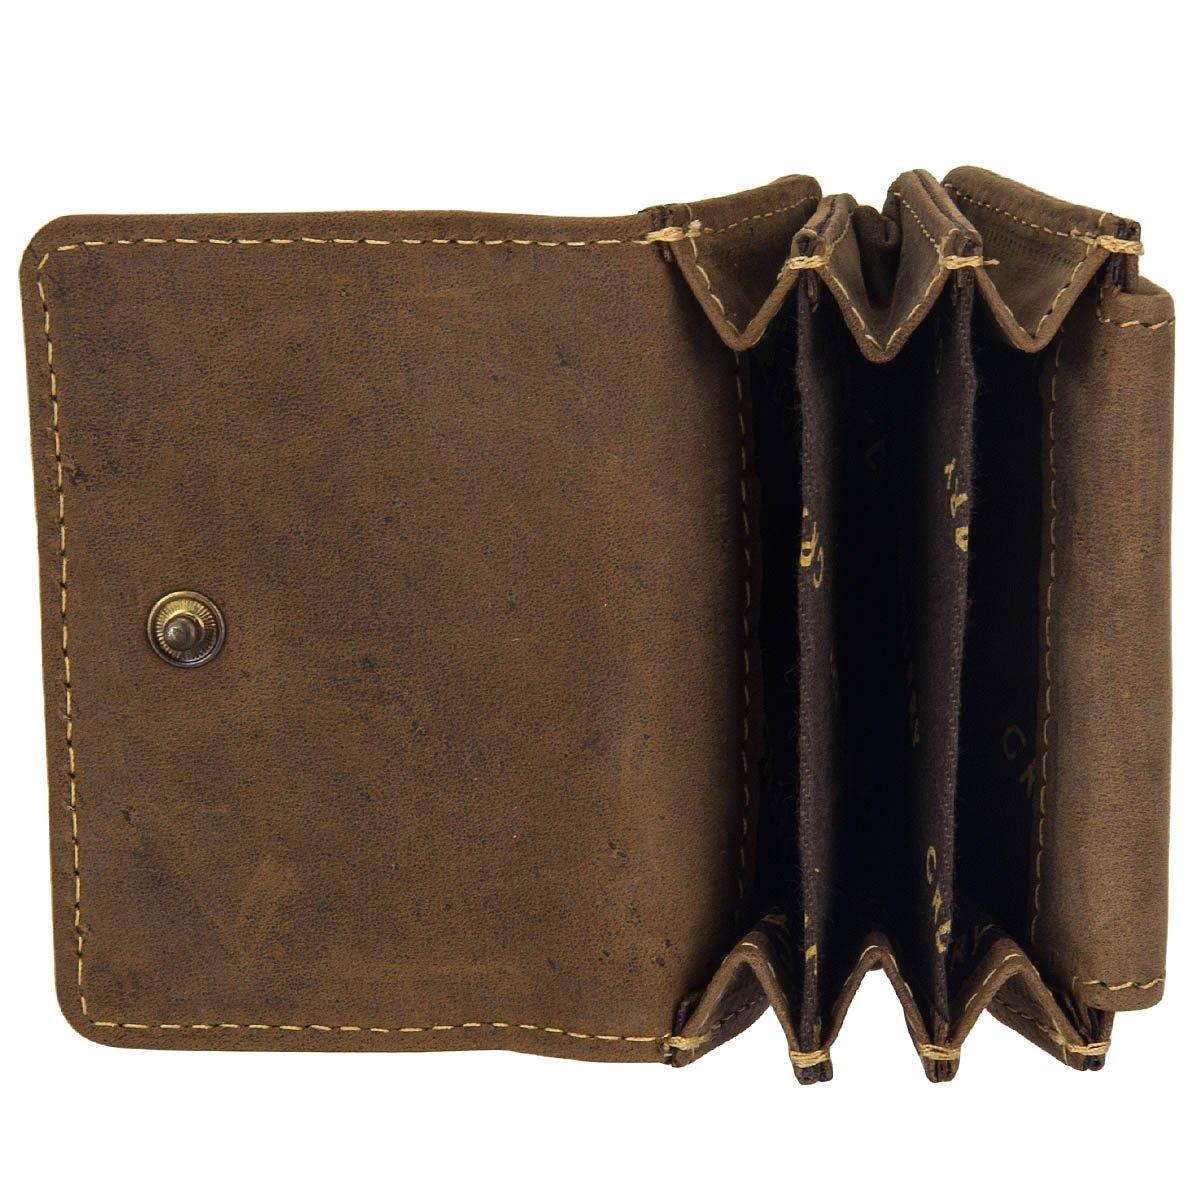 Greenburry Vintage bourse cuir 8 cm